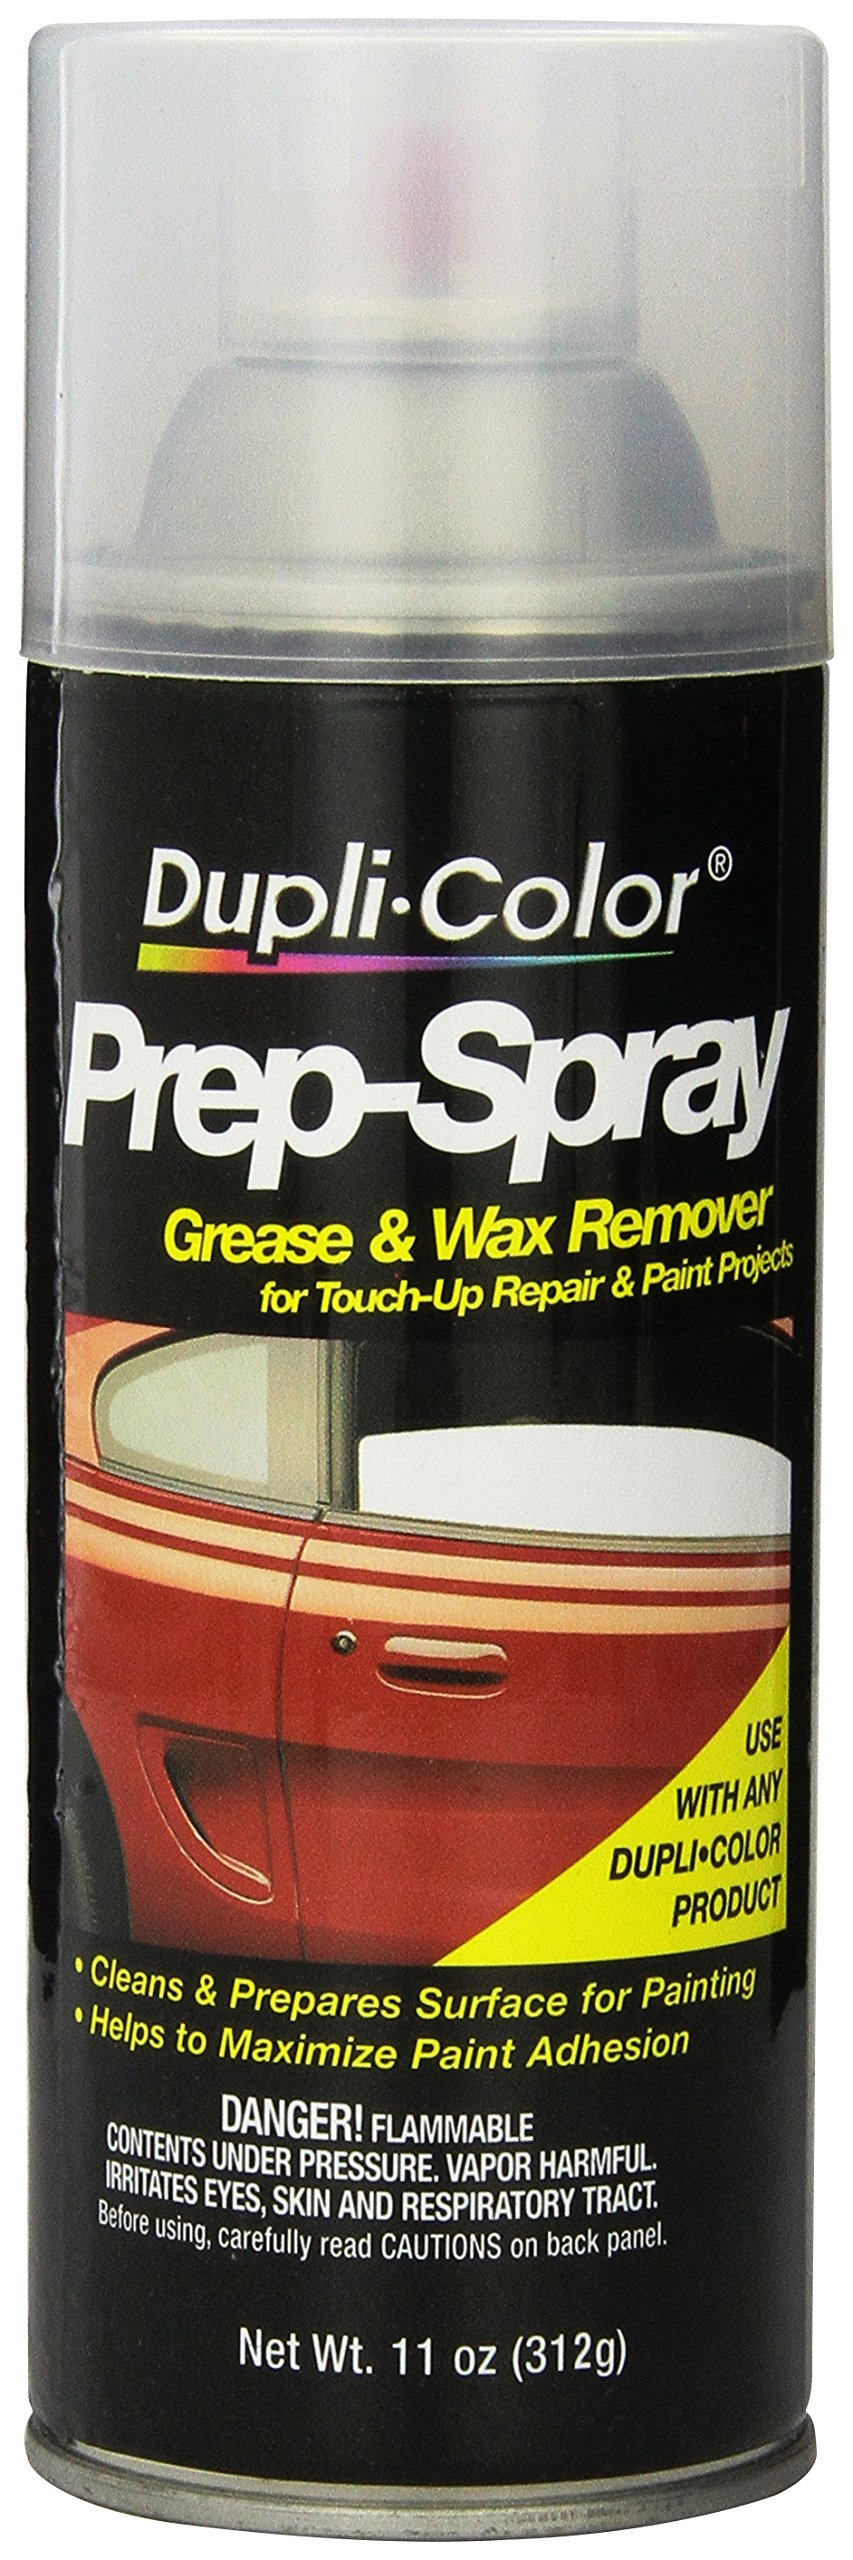 Dupli-Color (PS100-6 PK Grease and Wax Remover - 11 oz. Aerosol, (Case of 6) by Dupli-Color (Image #1)